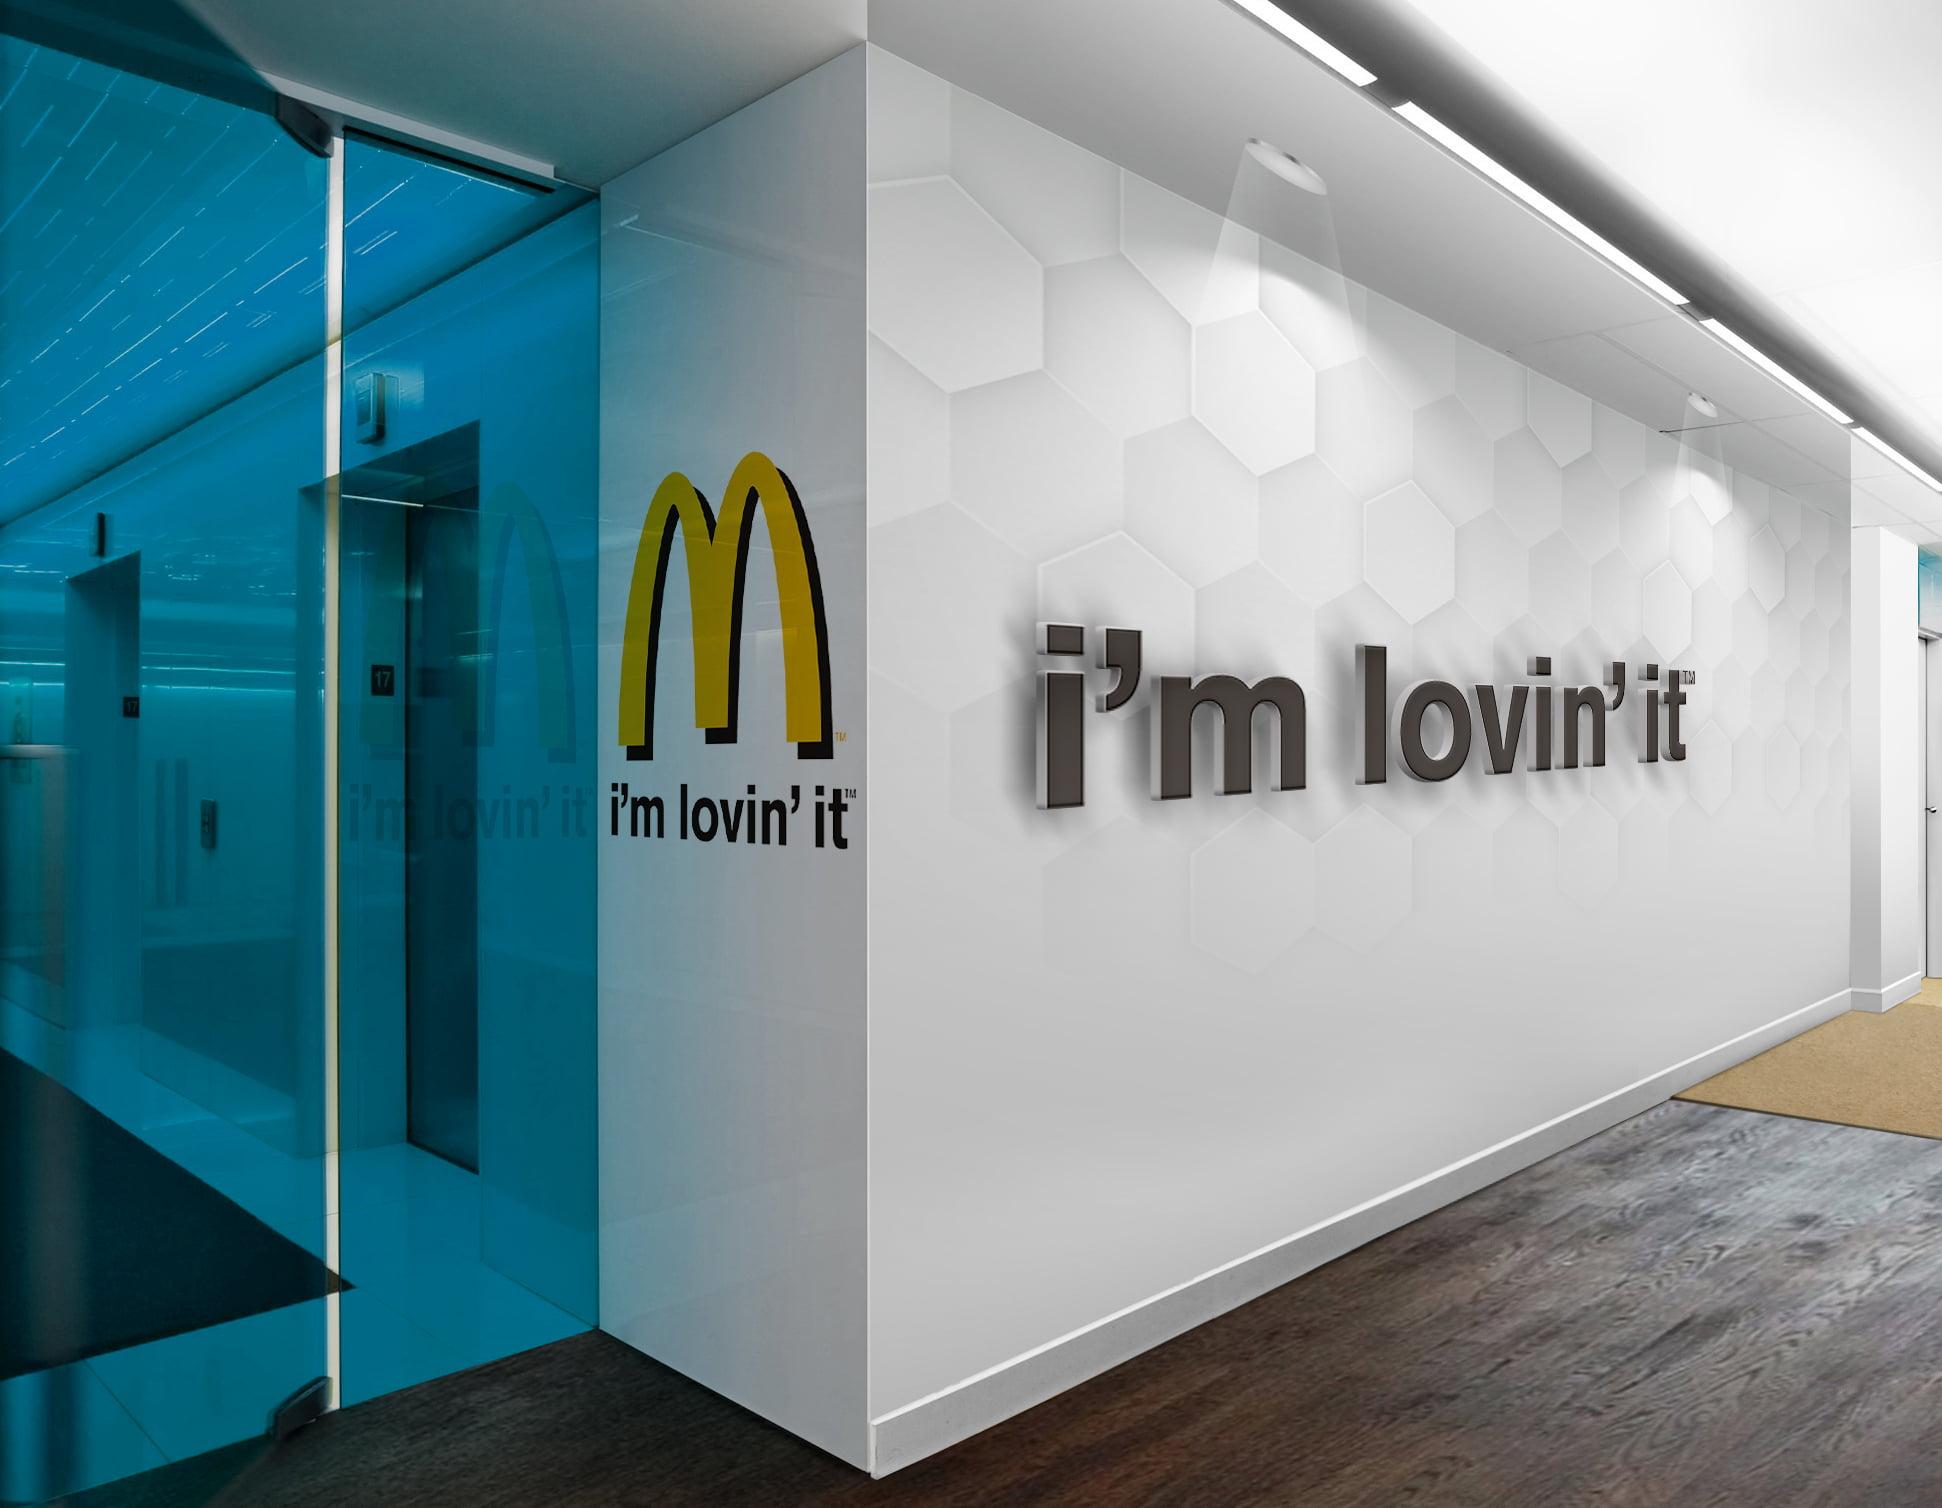 McDonalds-3D-Wall-Logo-&-Slogan-Mockup